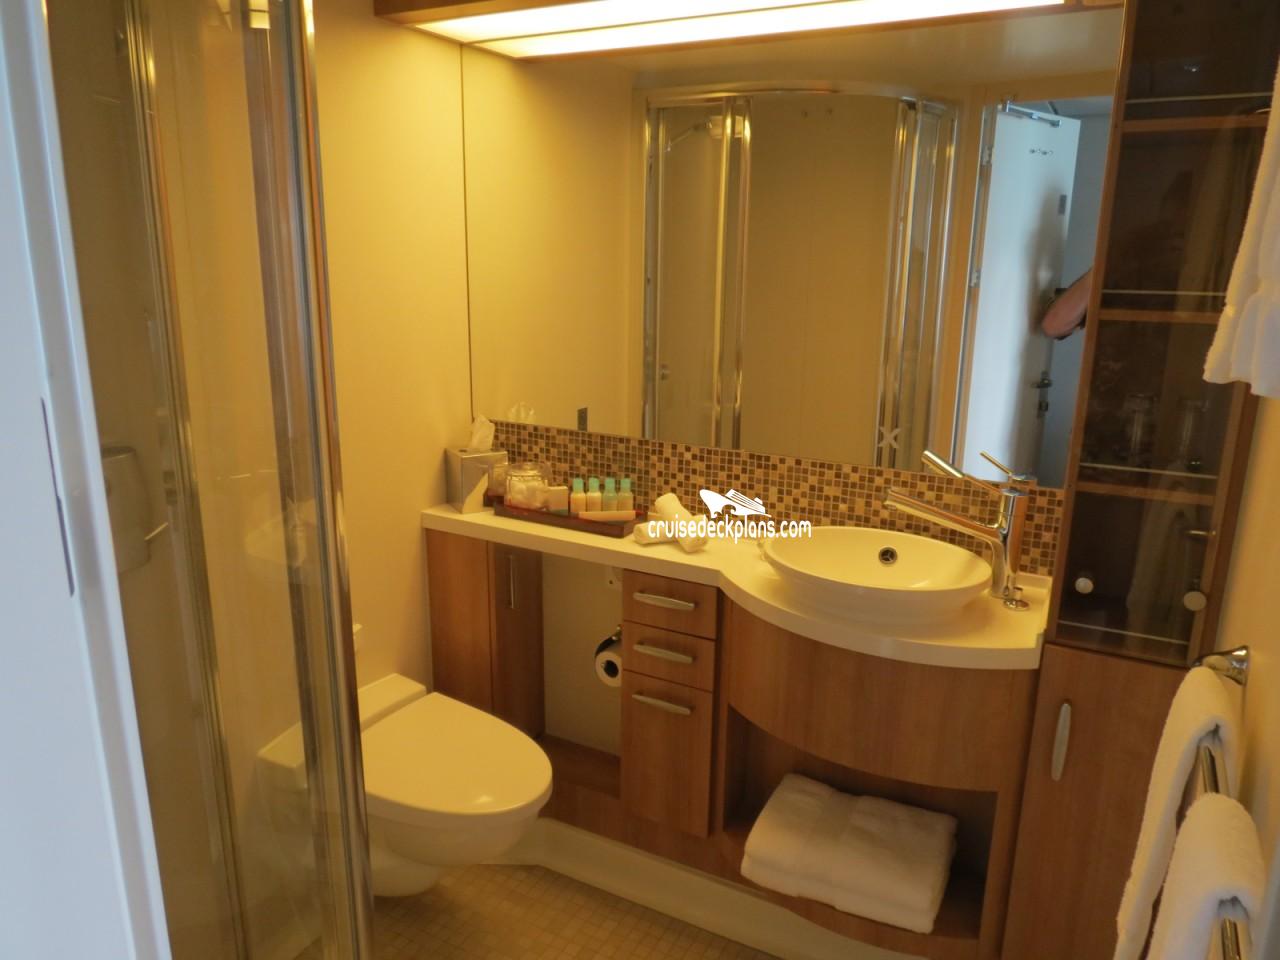 Celebrity Solstice Cabin 1263 - Category C3 - Concierge ...